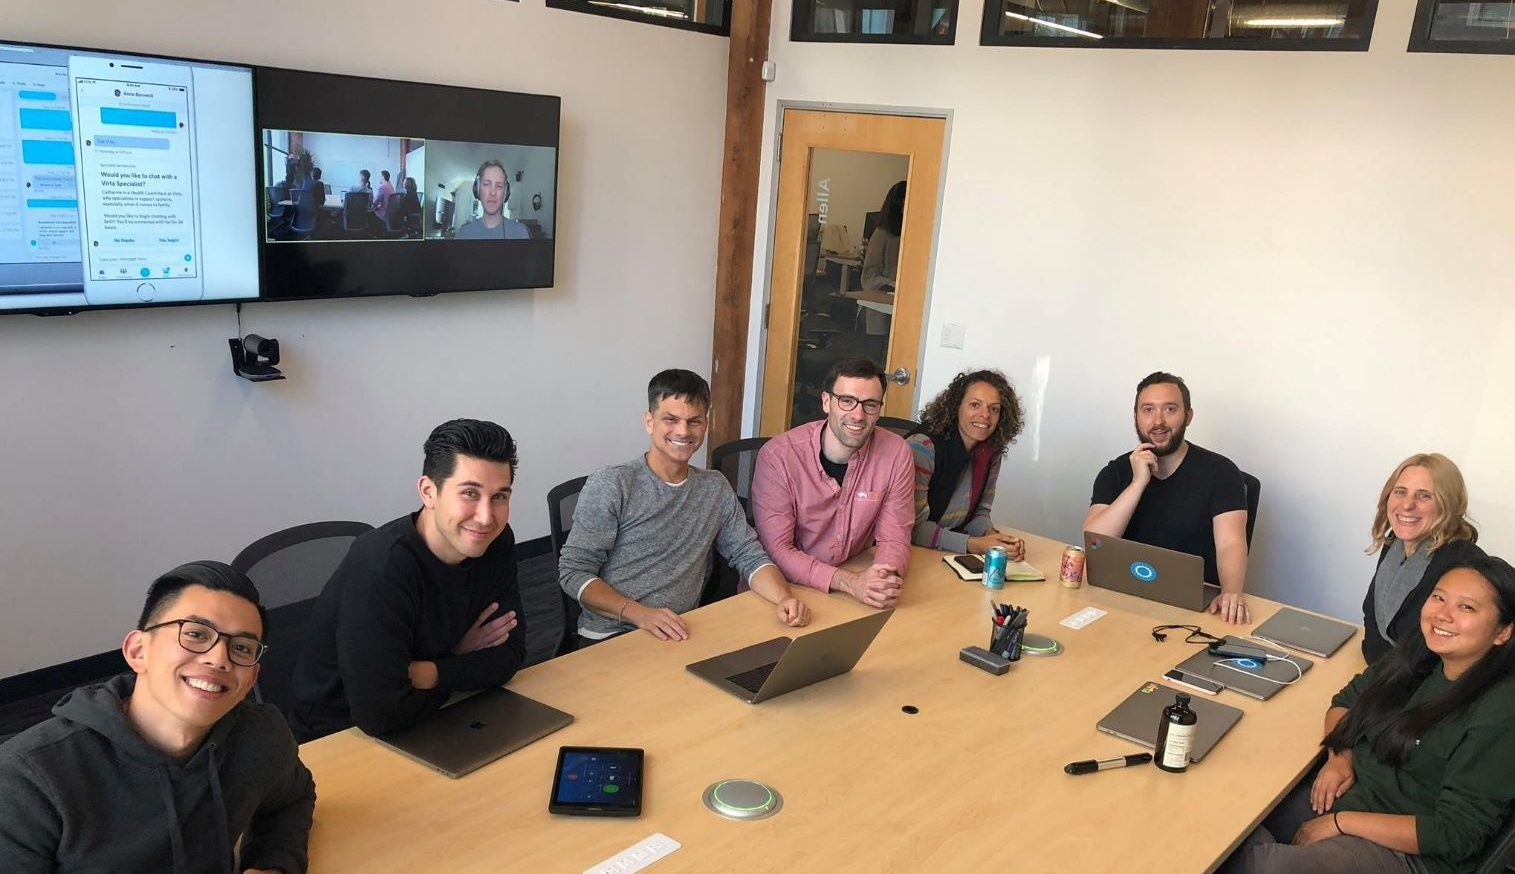 Virta Health team collaborate on product roadmap